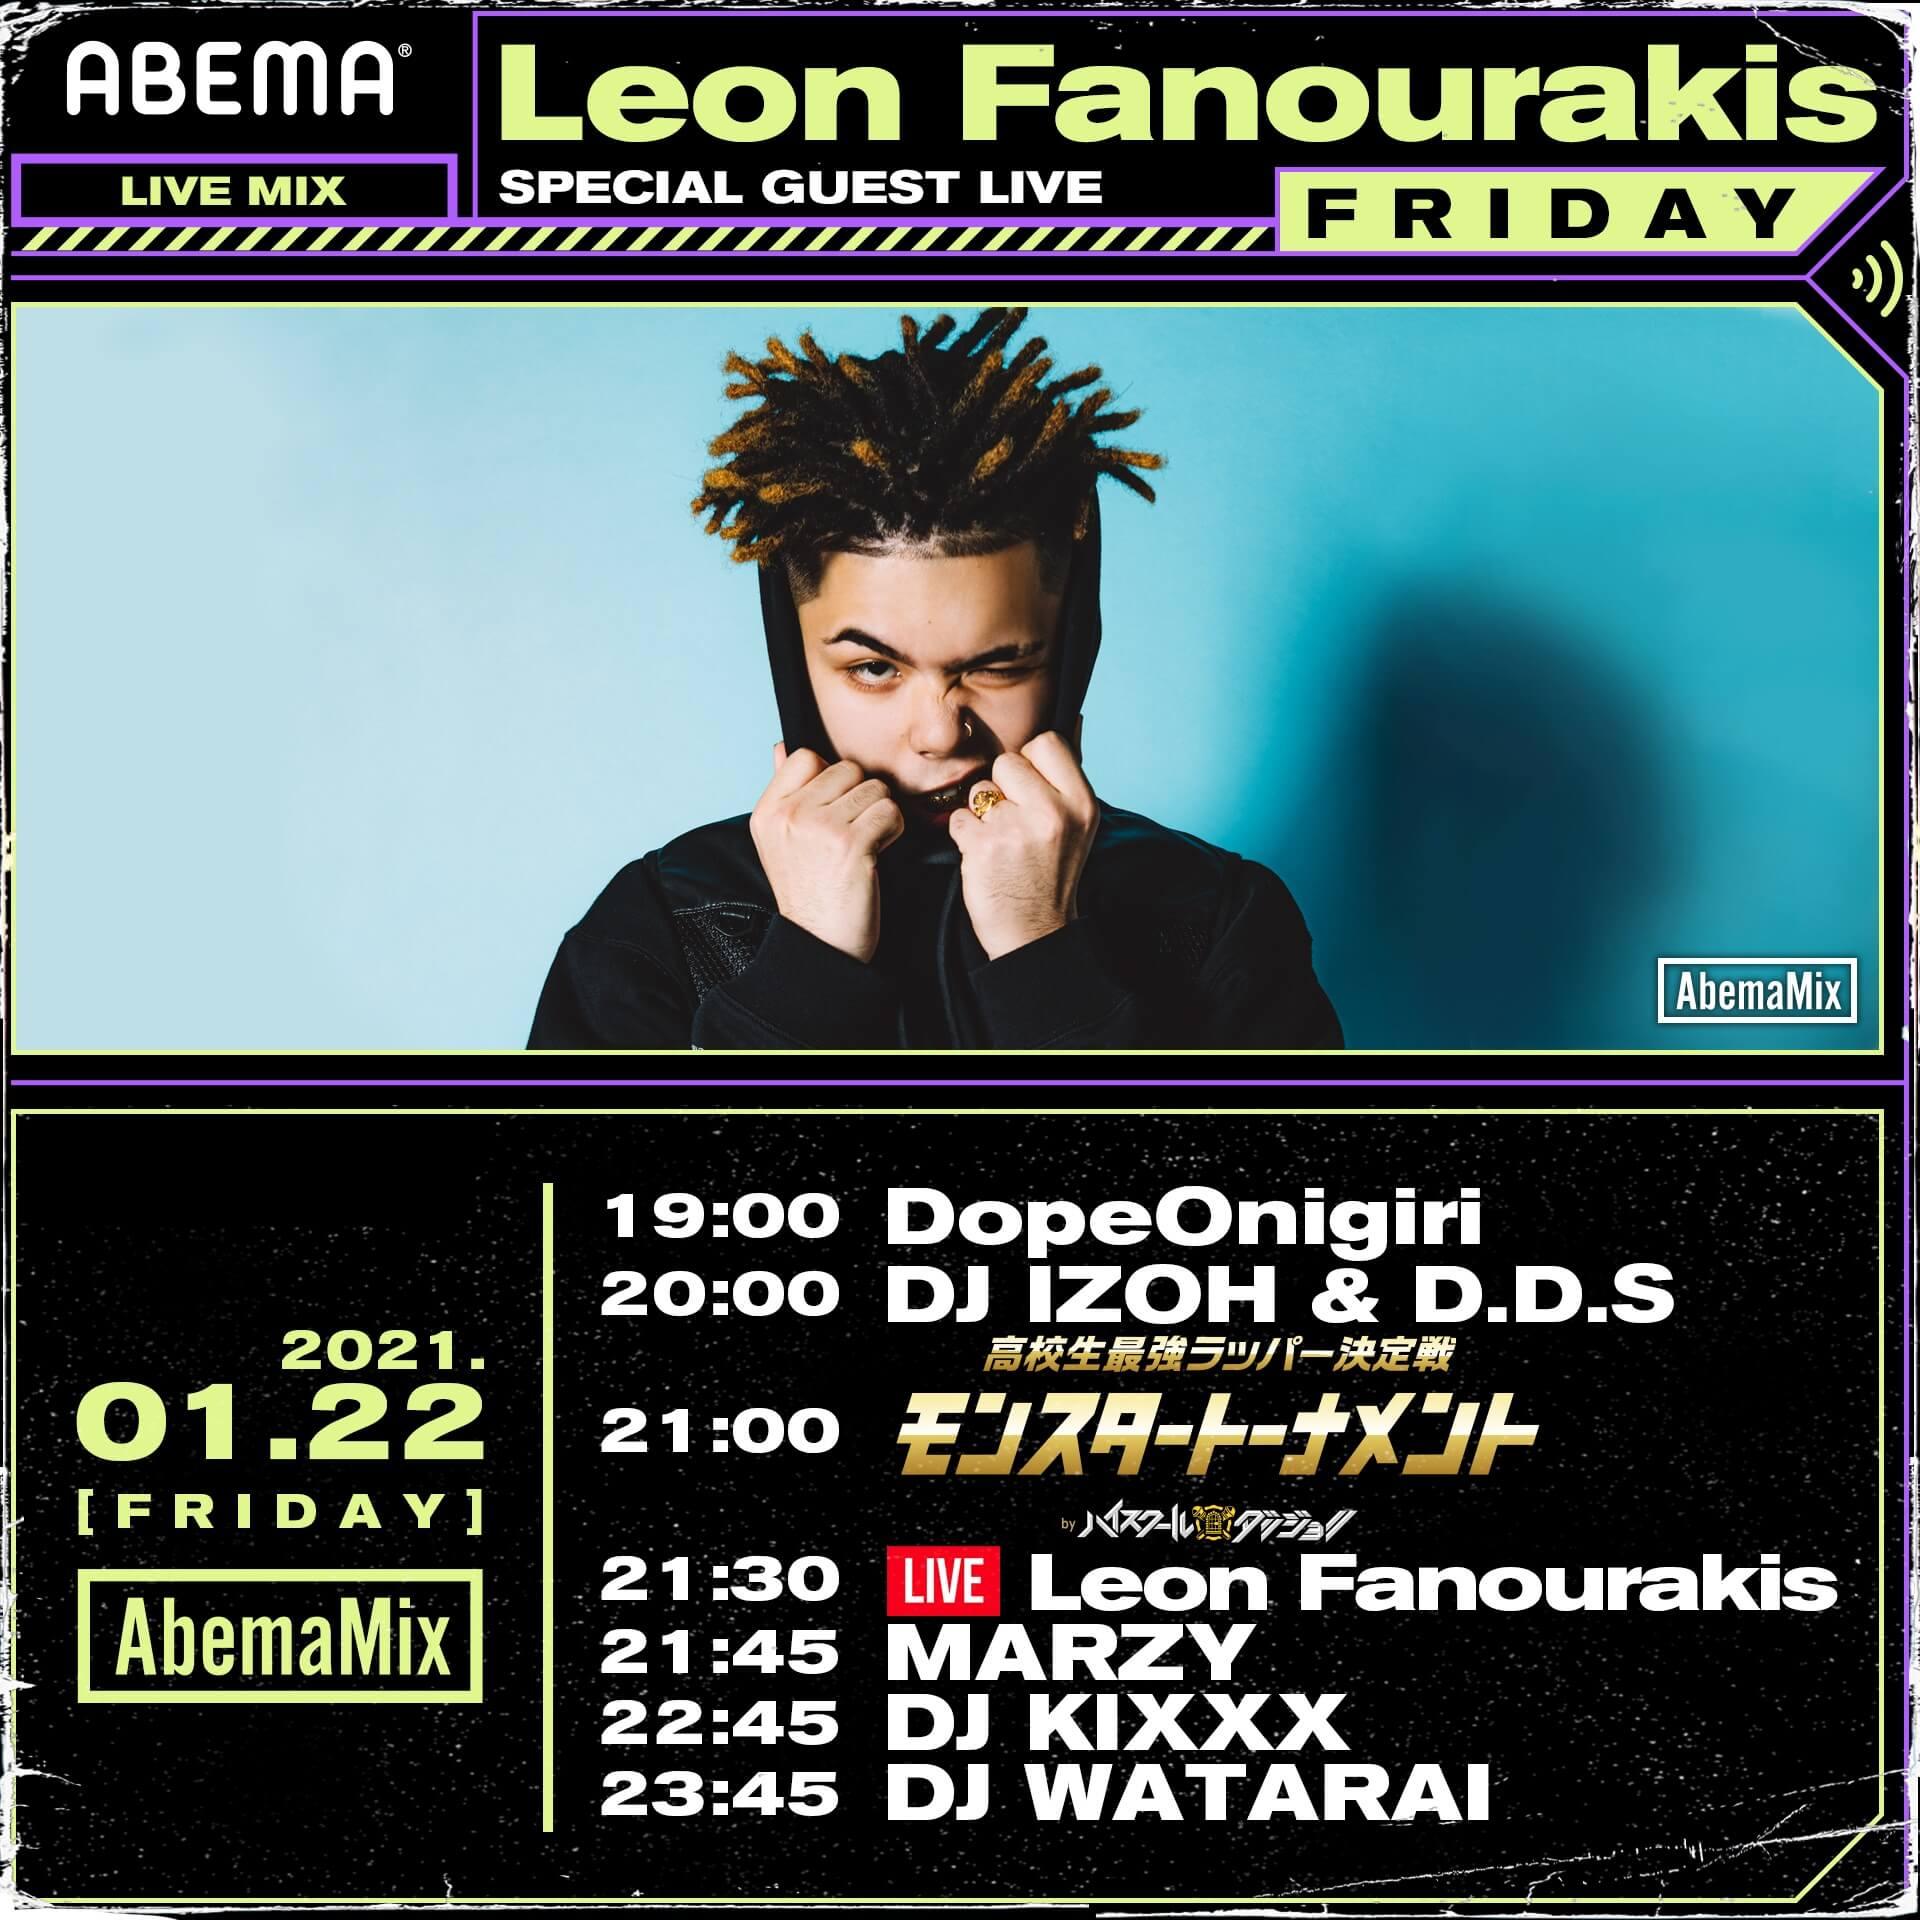 Leon FanourakisがWILYWNKA、JP THE WAVY、LEXらを客演に迎えた2ndアルバム『SHISHIMAI』を本日リリース!AbemaMixで今夜生ライブ披露 music210122_leonfanourakis_shishimai_1